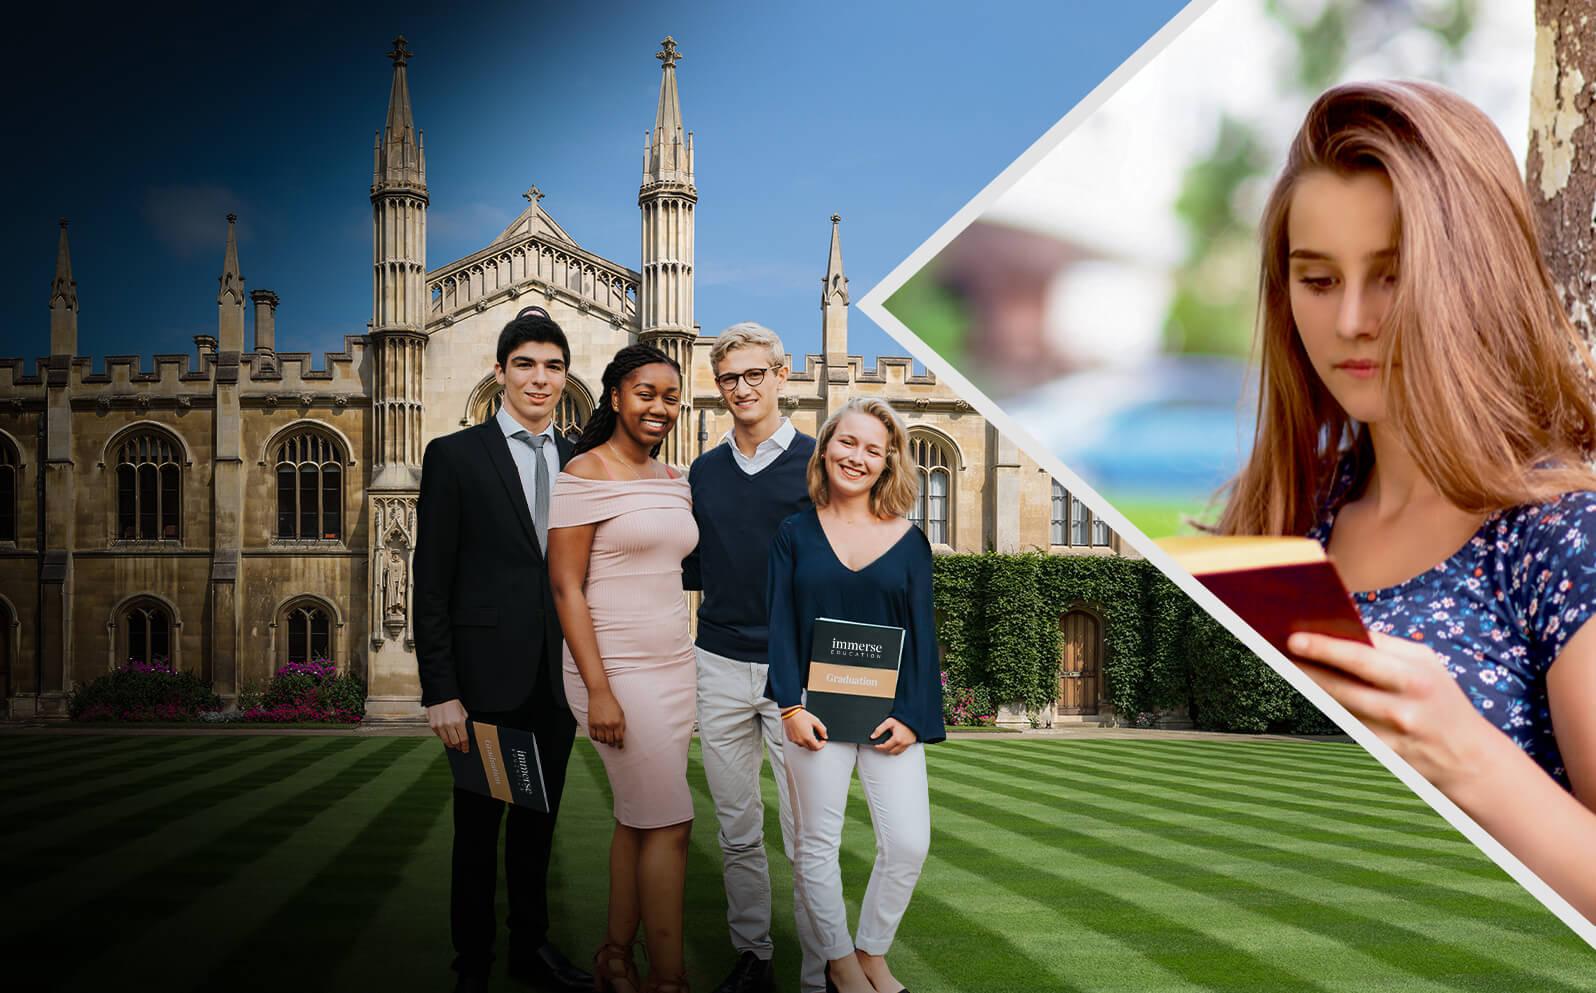 Cambridge English Literature Summer Program for Ages 16-18